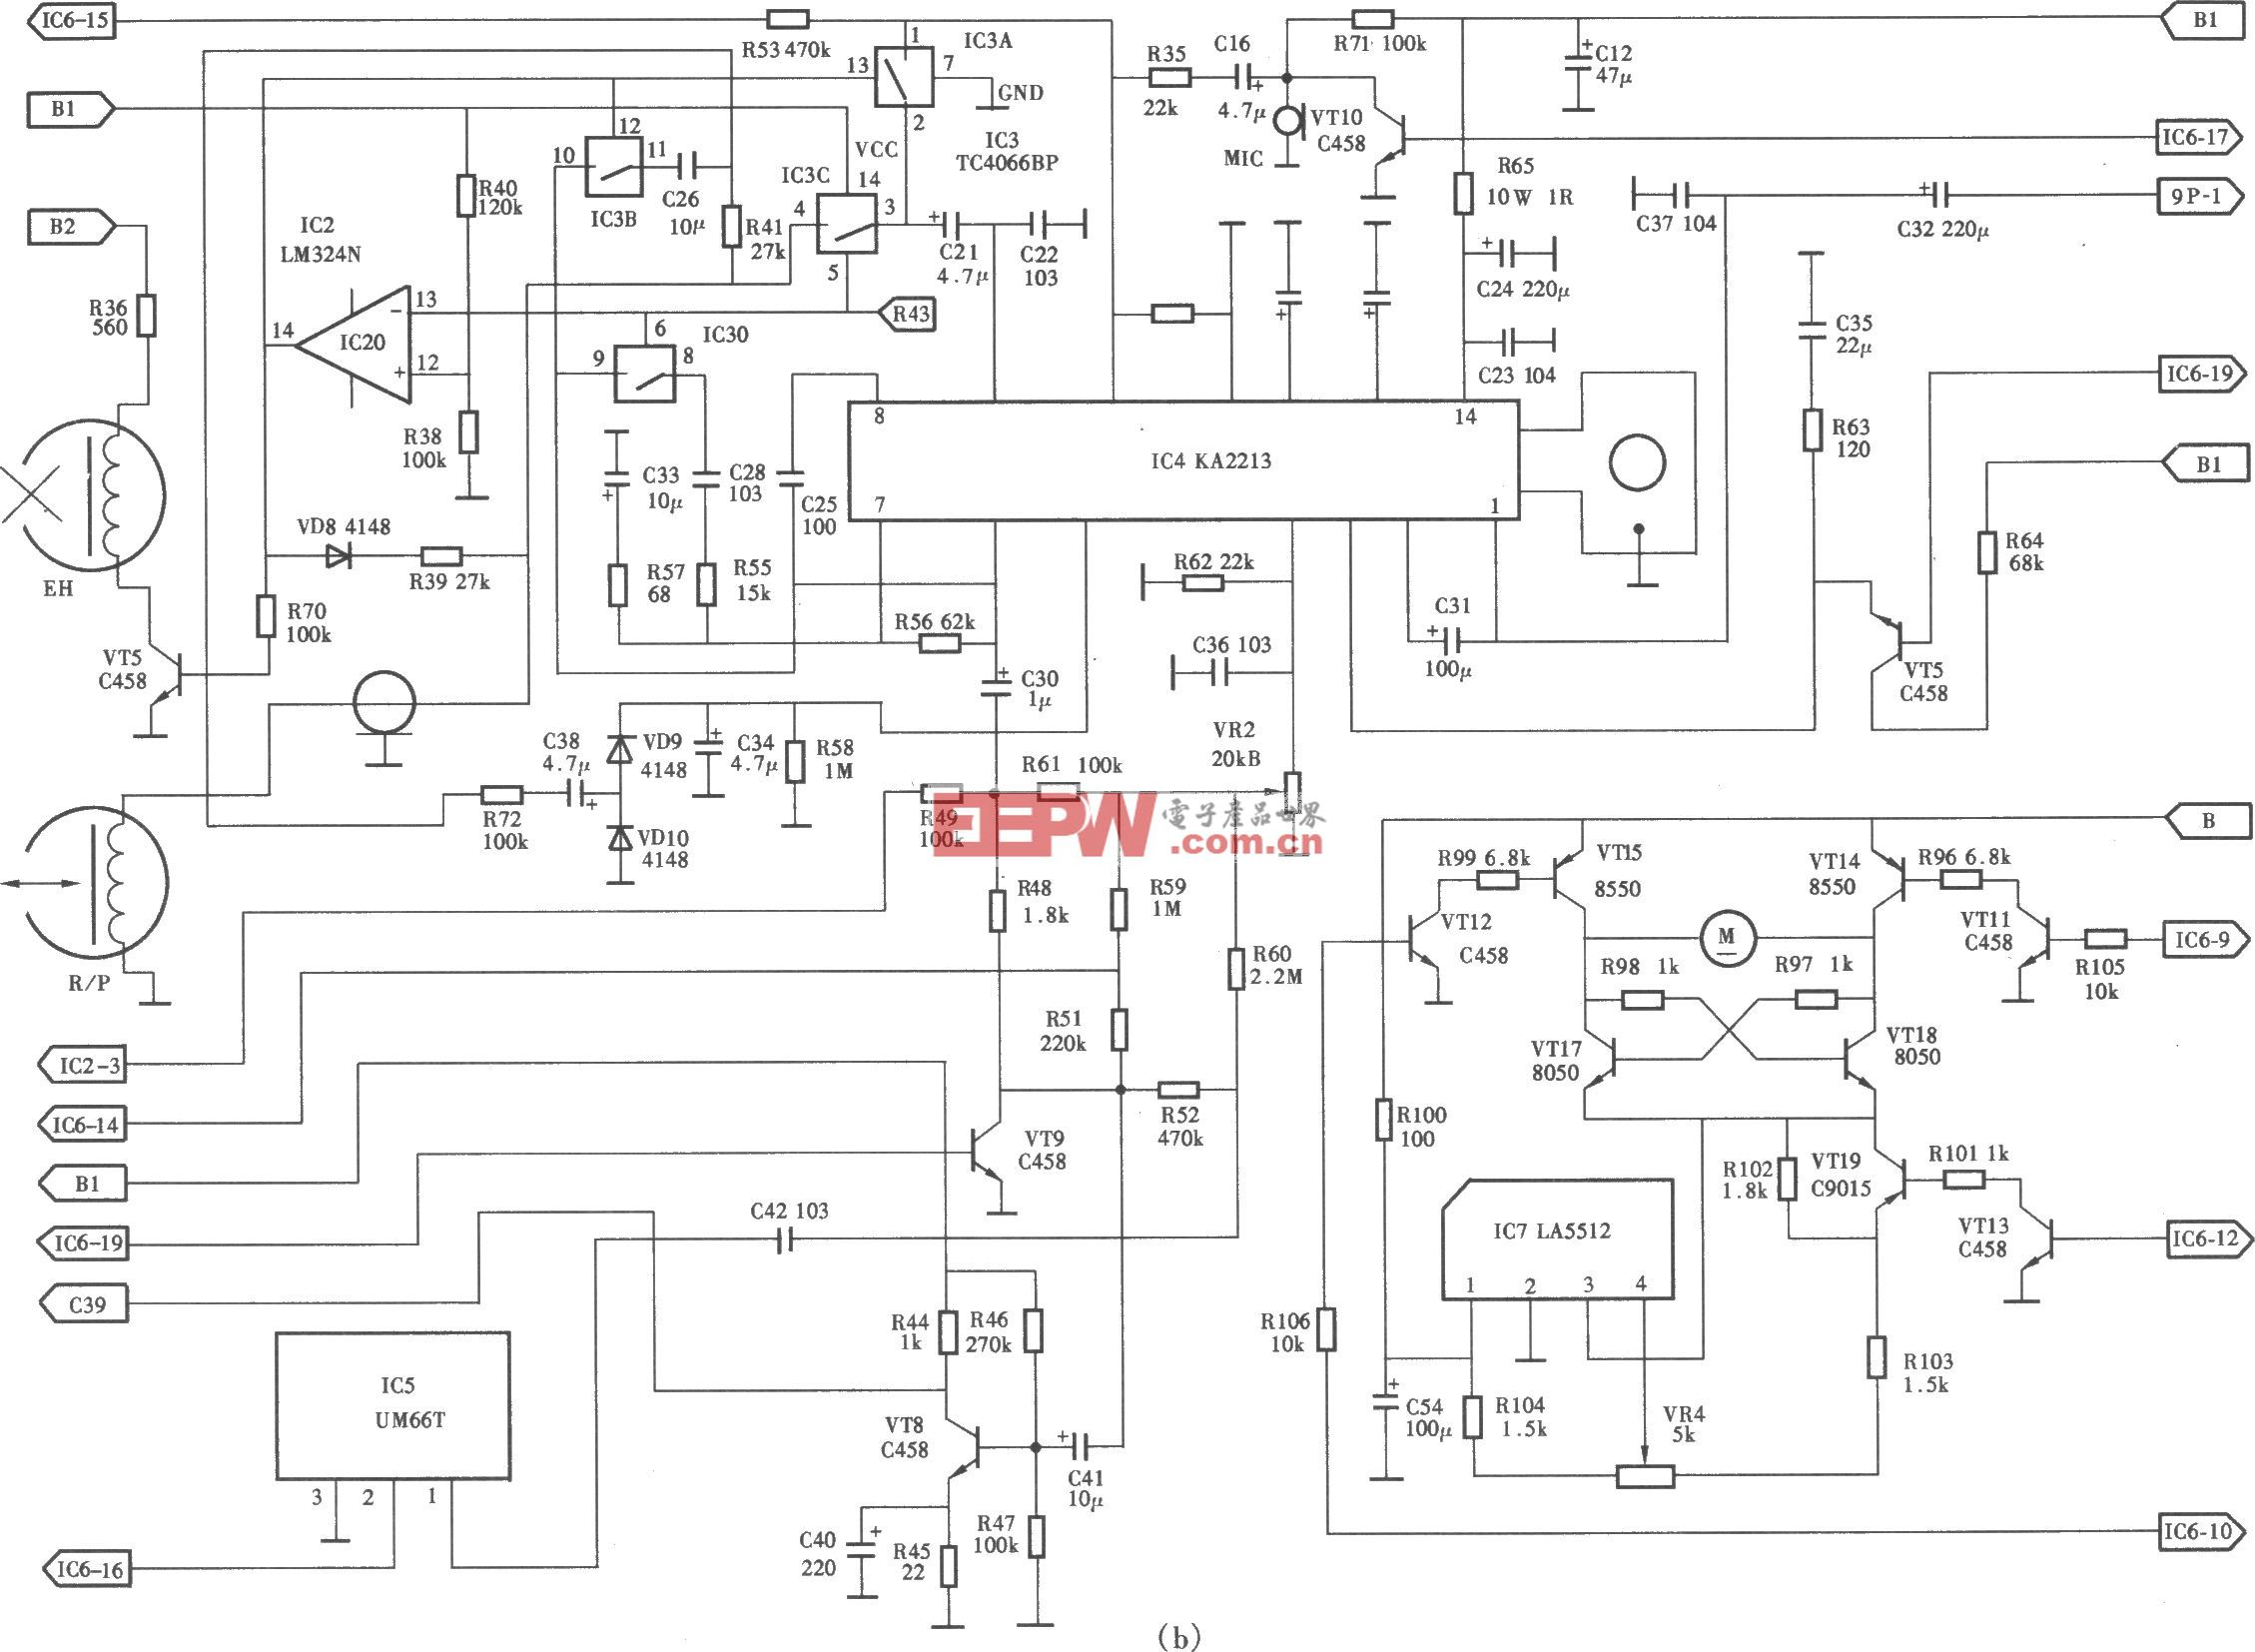 Technical028型電話答錄機電路(b)